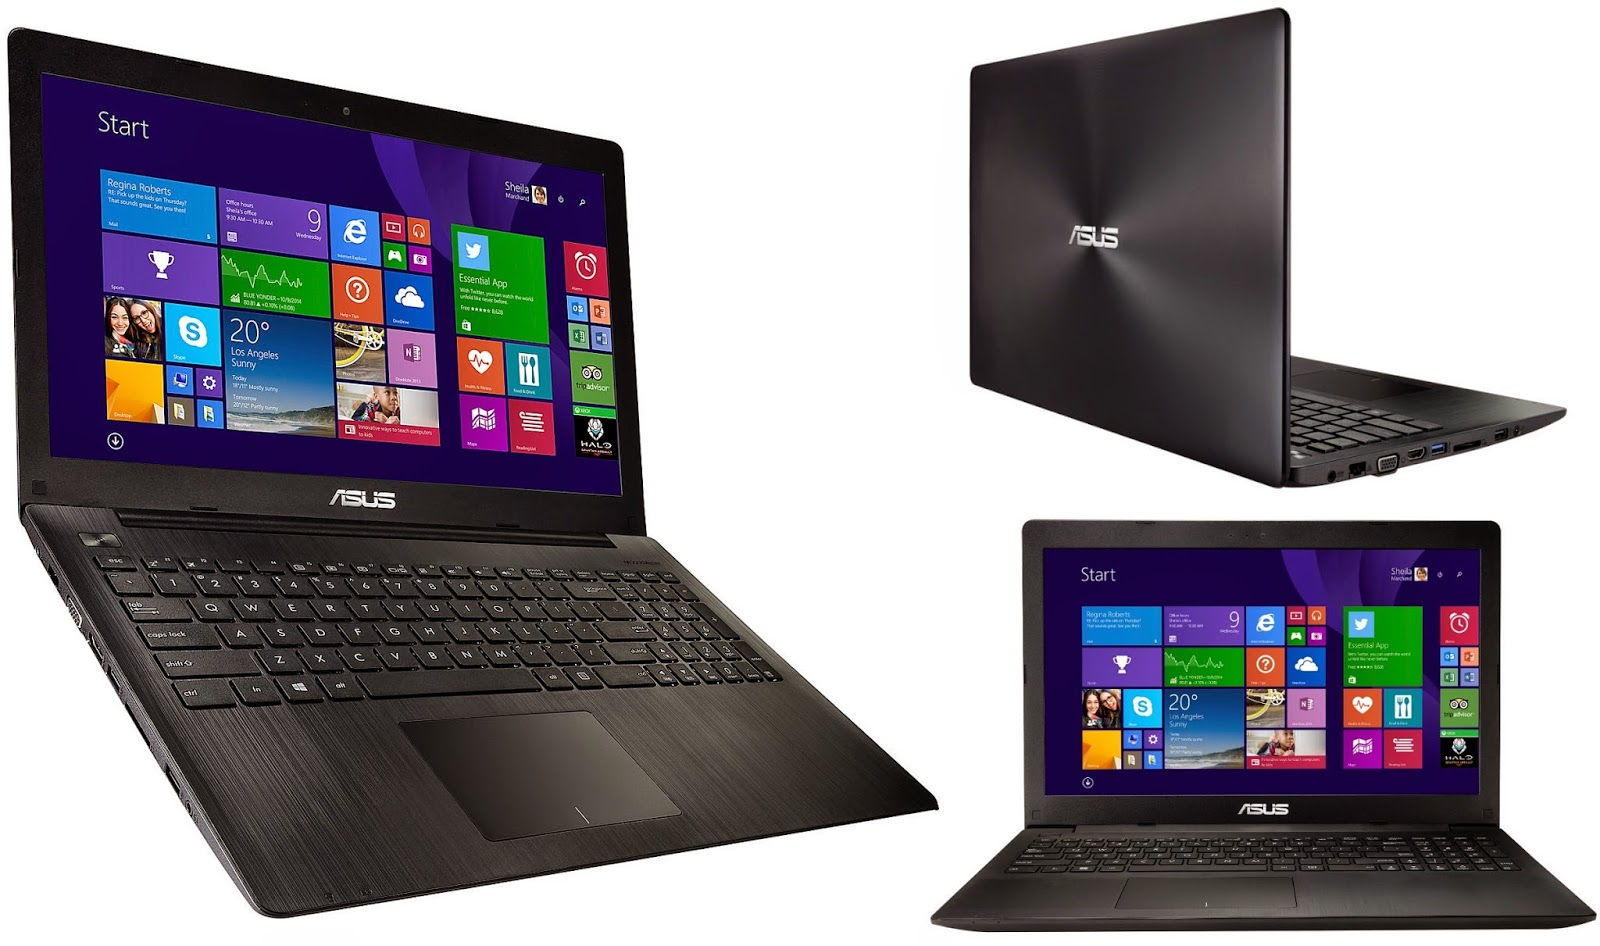 asus x series x553ma-sx527b notebook